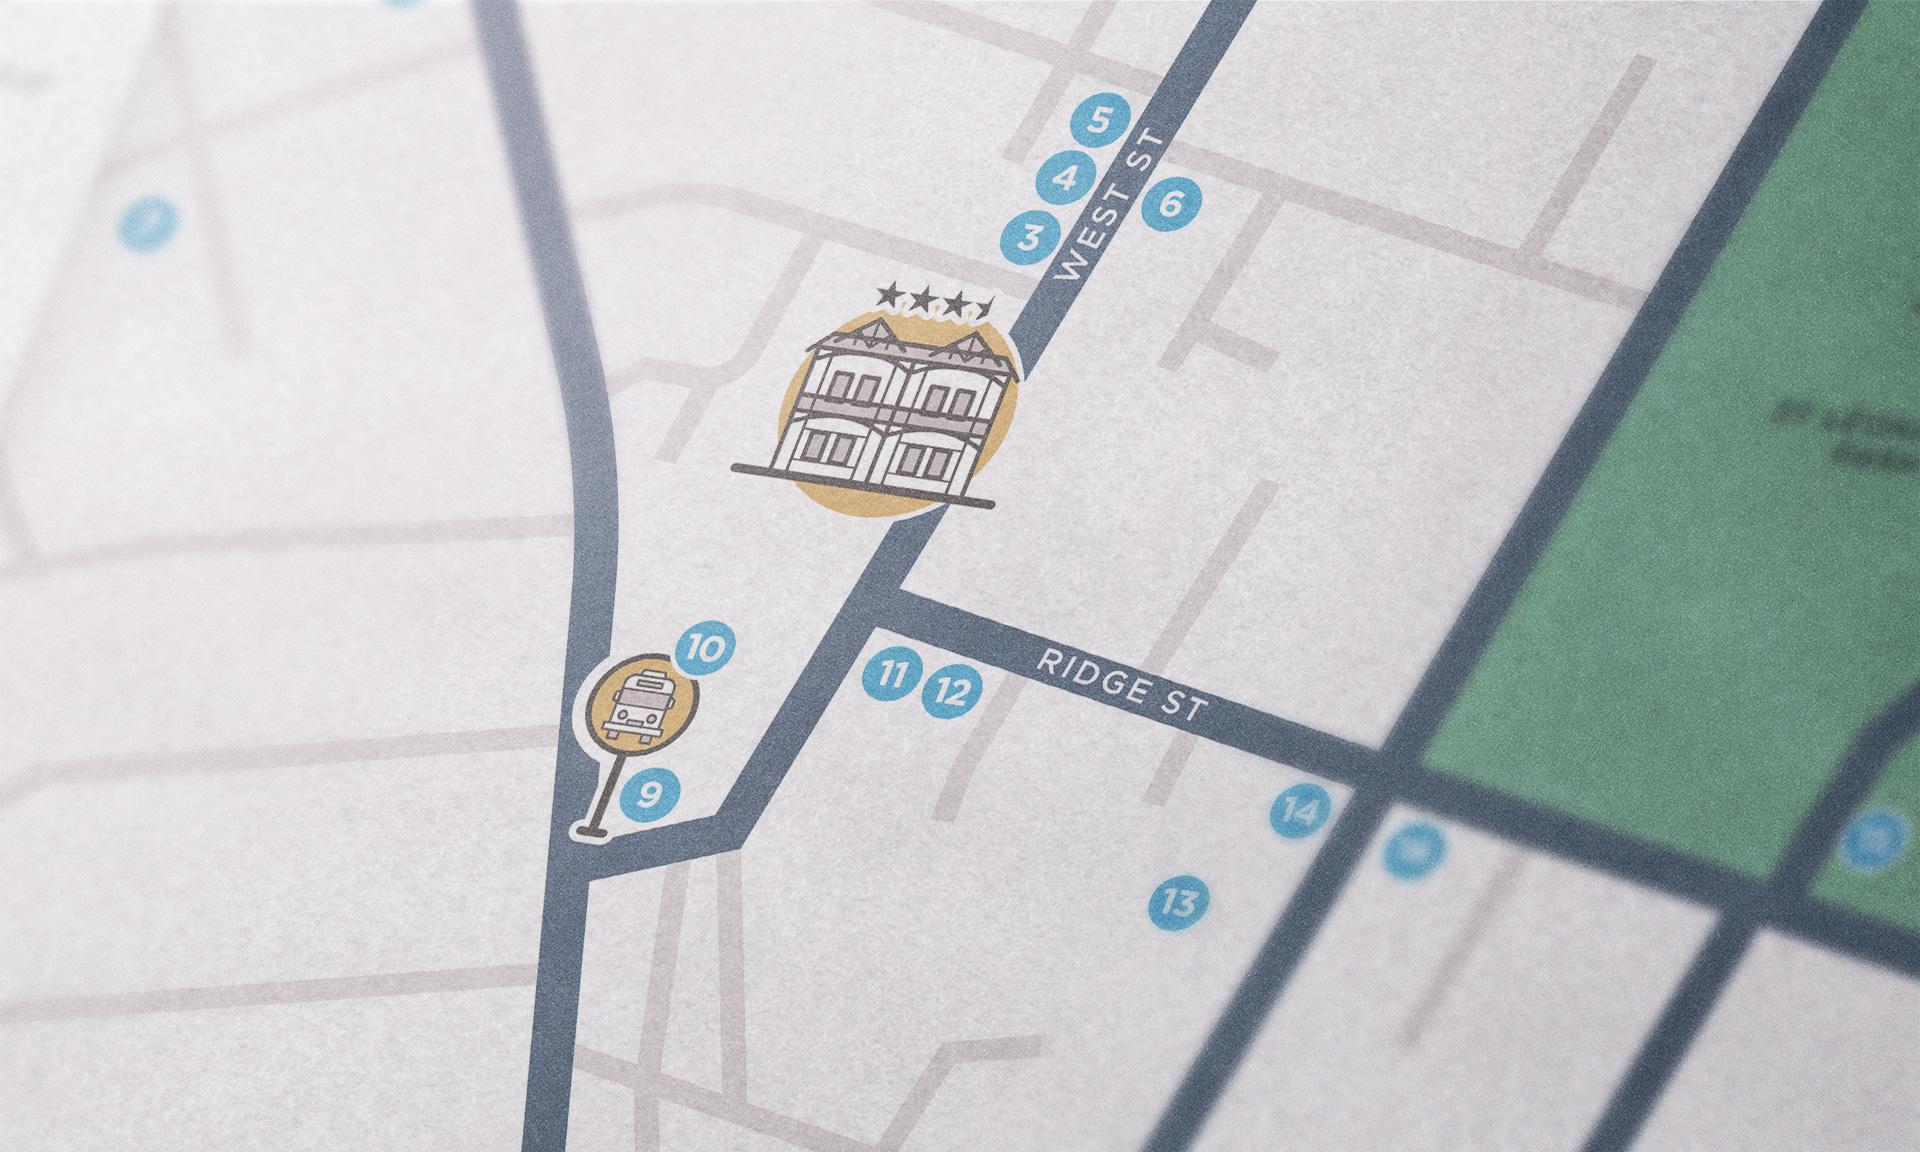 Dalziel Lodge map close-up